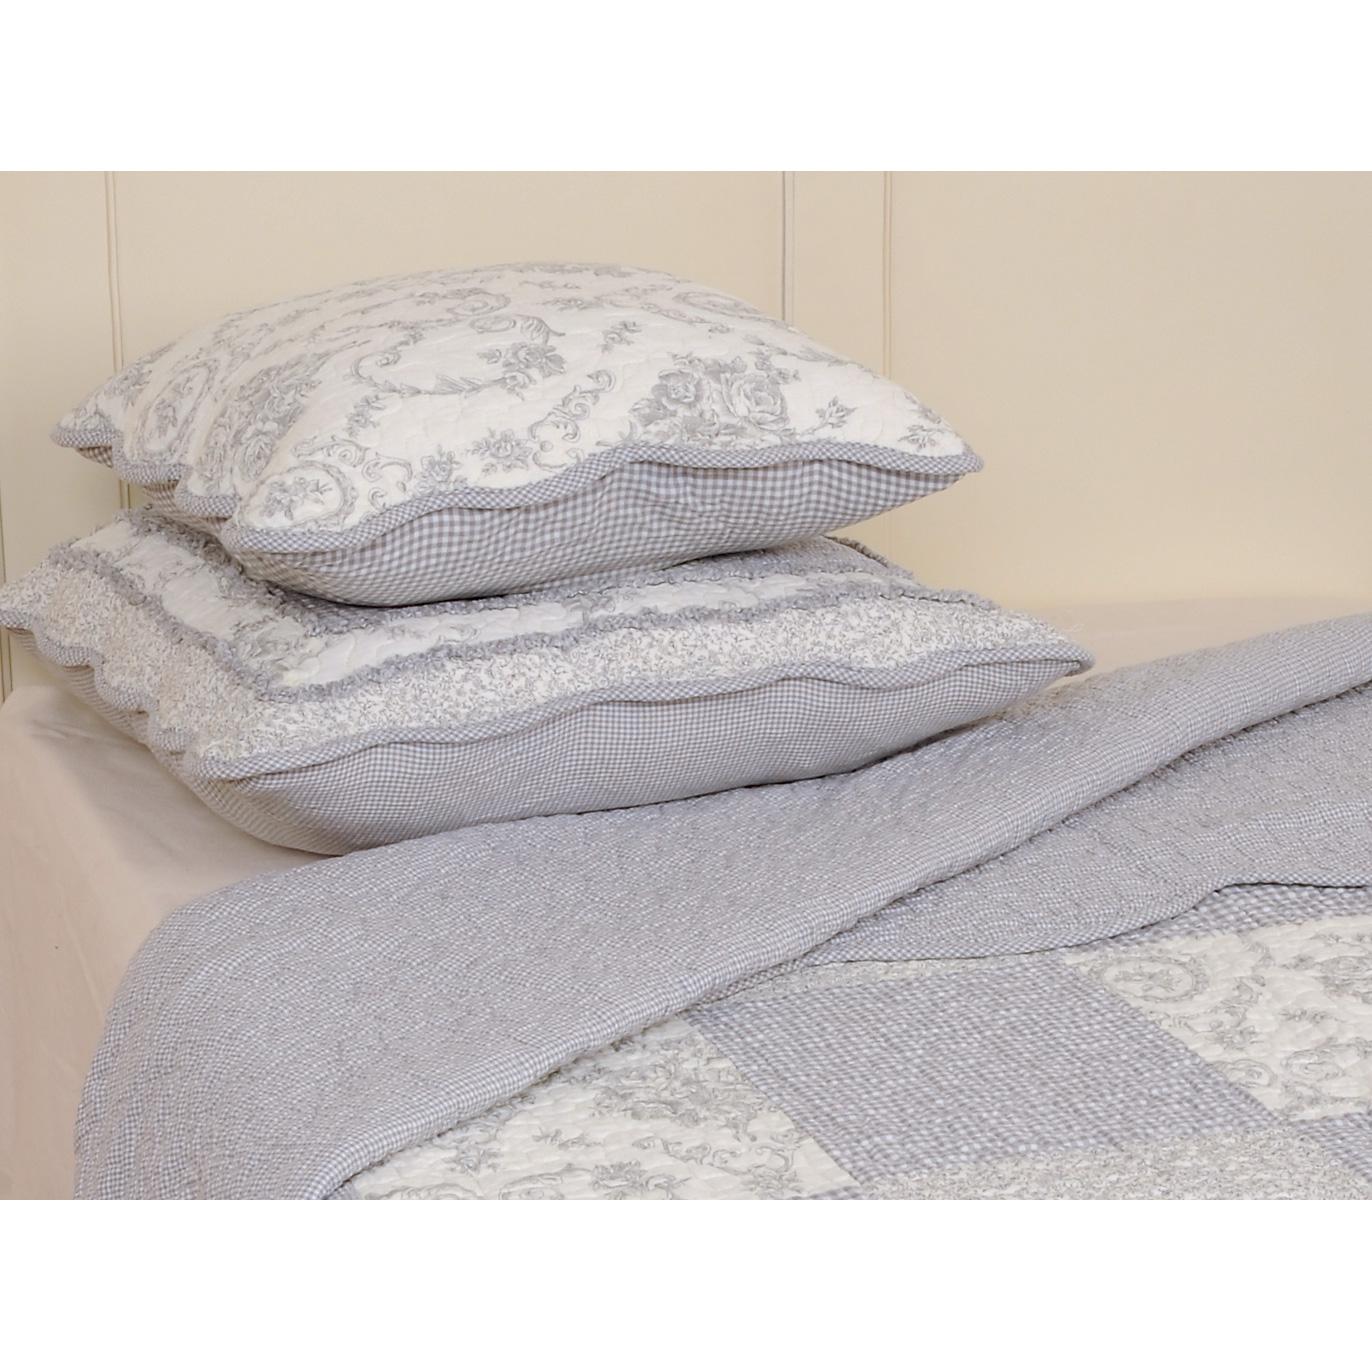 clayre eef tagesdecke plaid grau patchwork 180x260cm. Black Bedroom Furniture Sets. Home Design Ideas